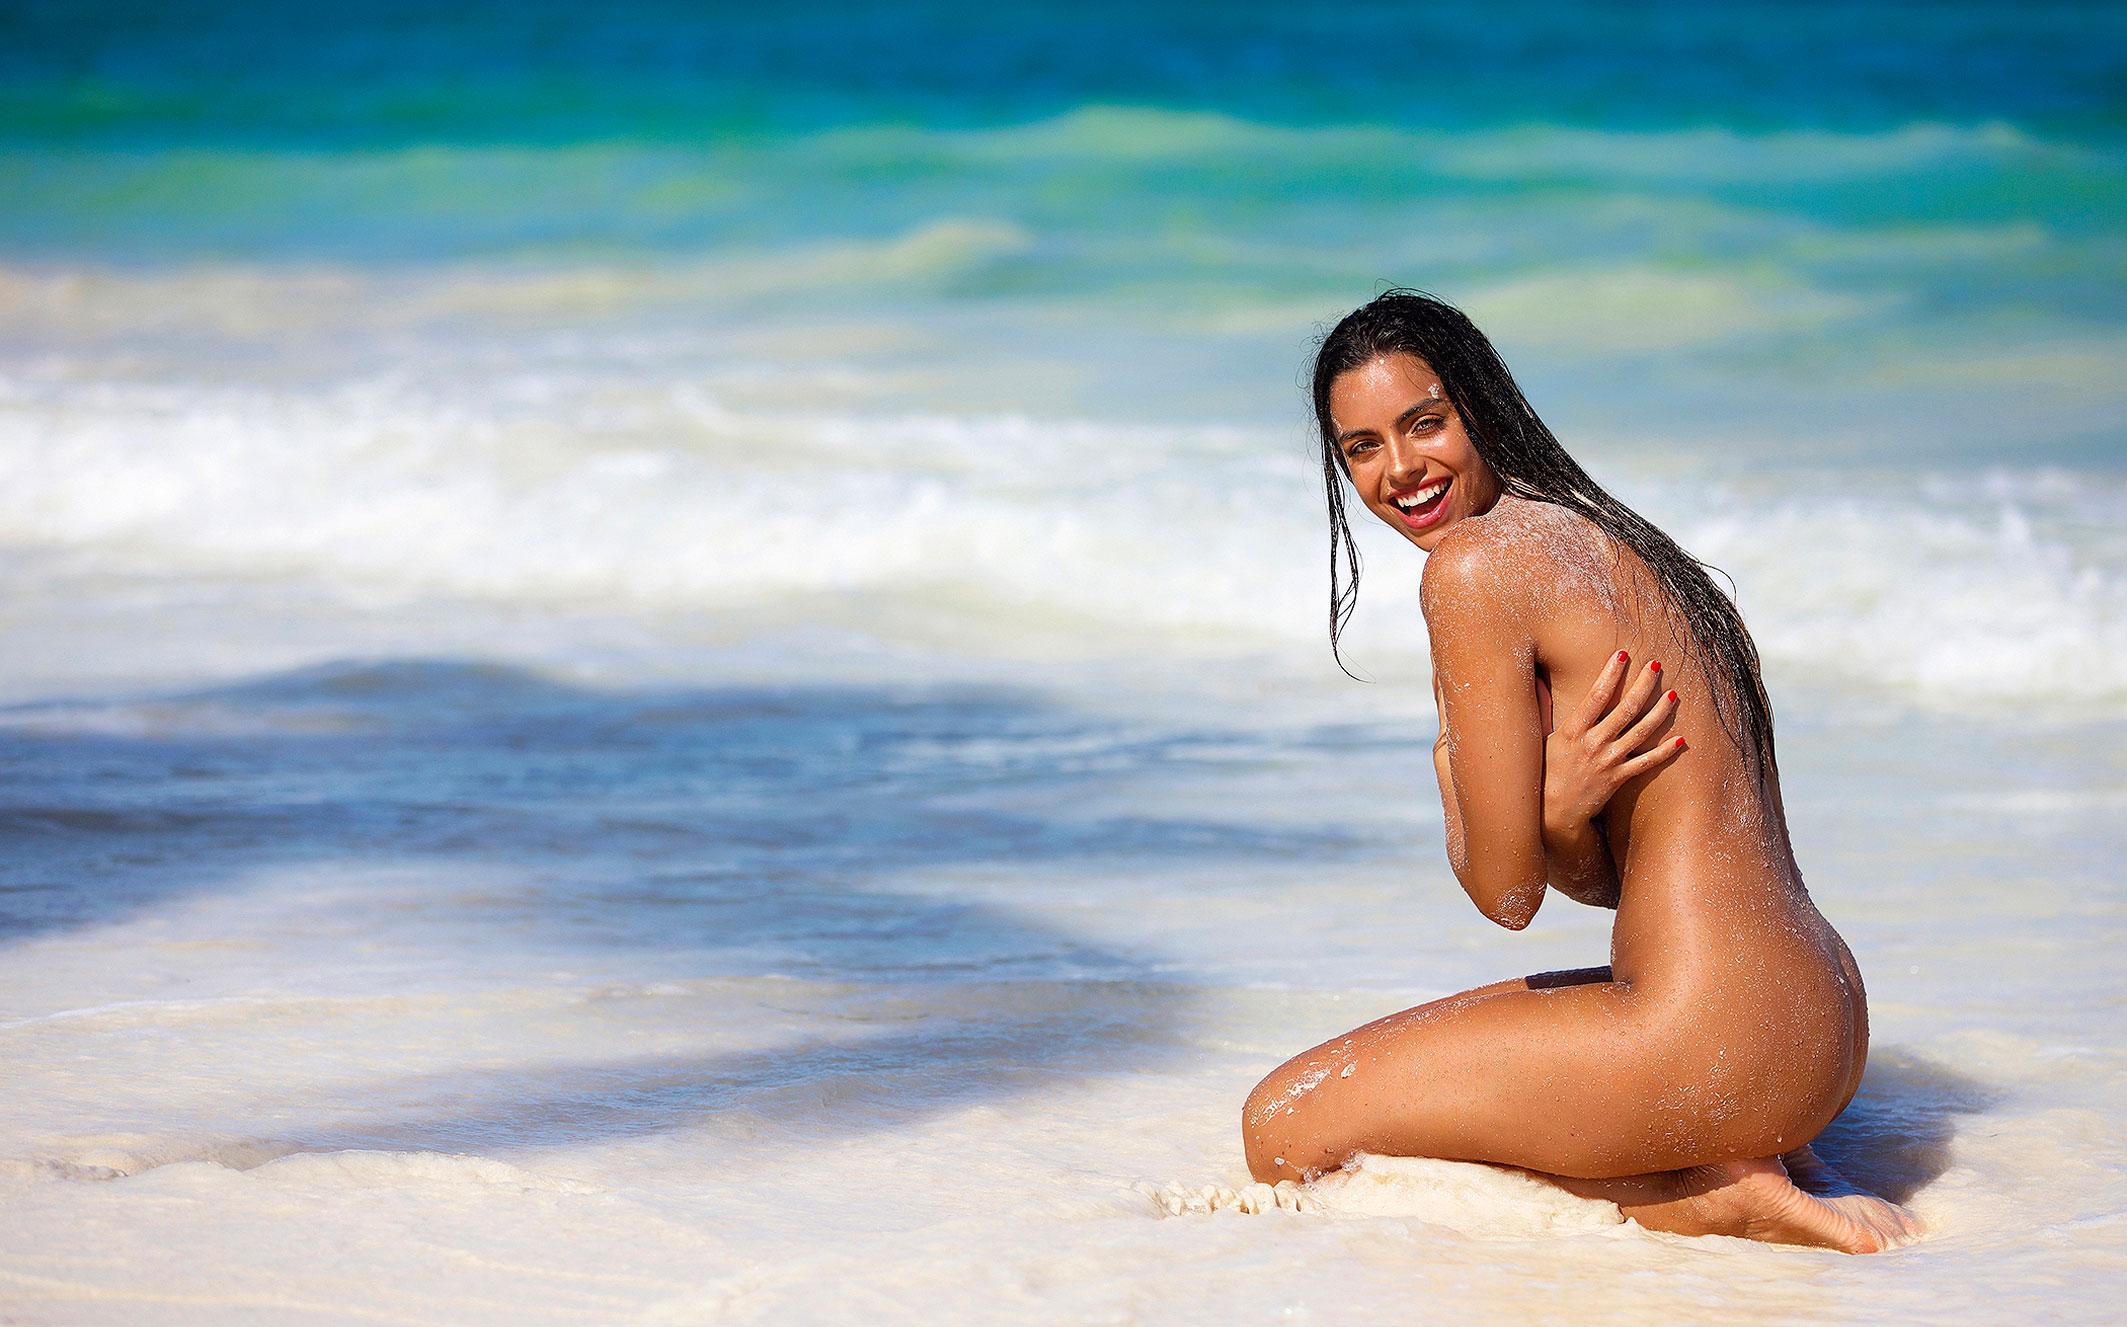 Голая пуэрториканка Присцилла Хаггинс на пляже Тулума / фото 21